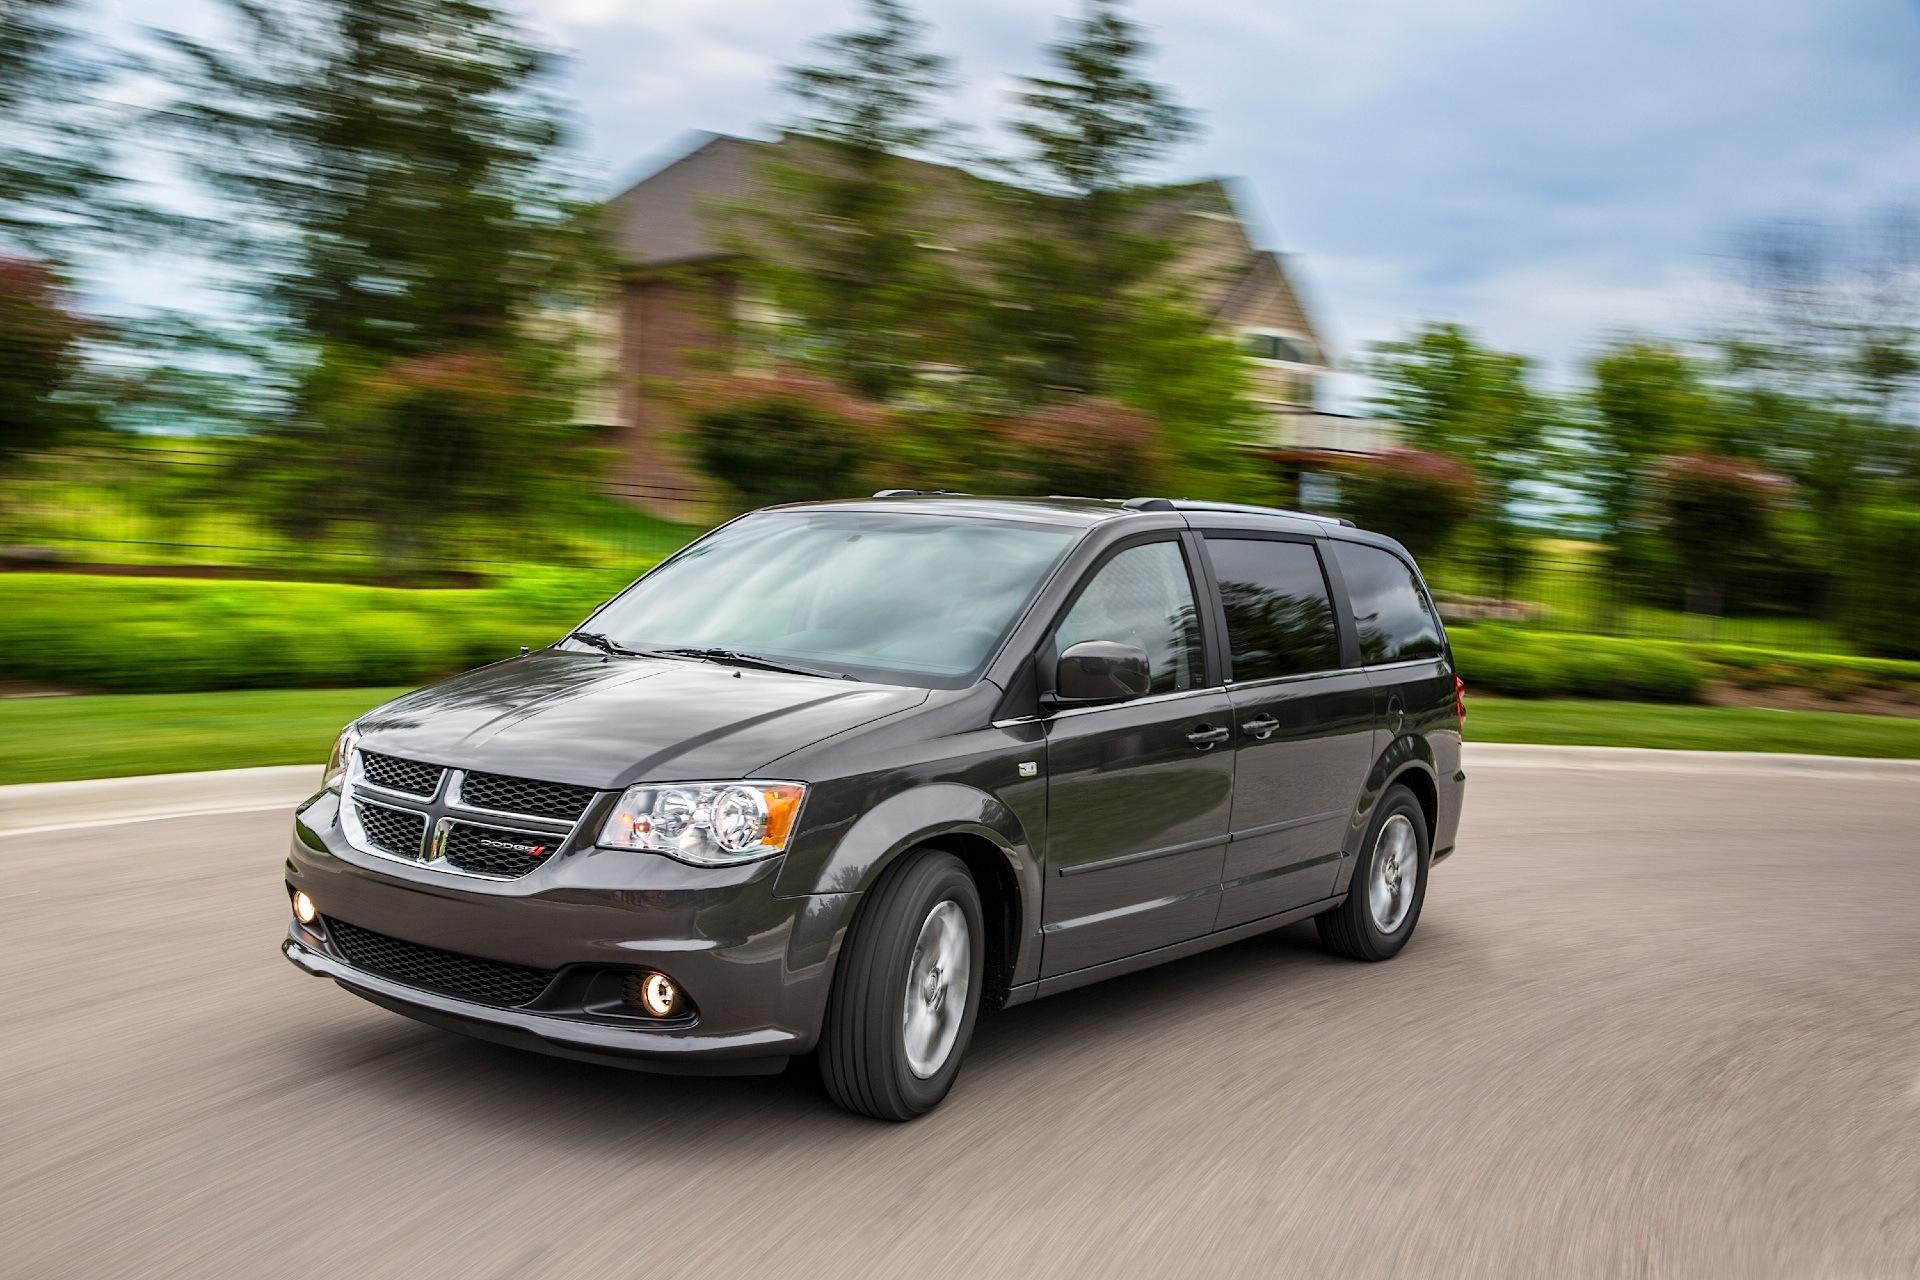 Dodge Grand Caravan 2008 2009 2010 2011 2012 2013